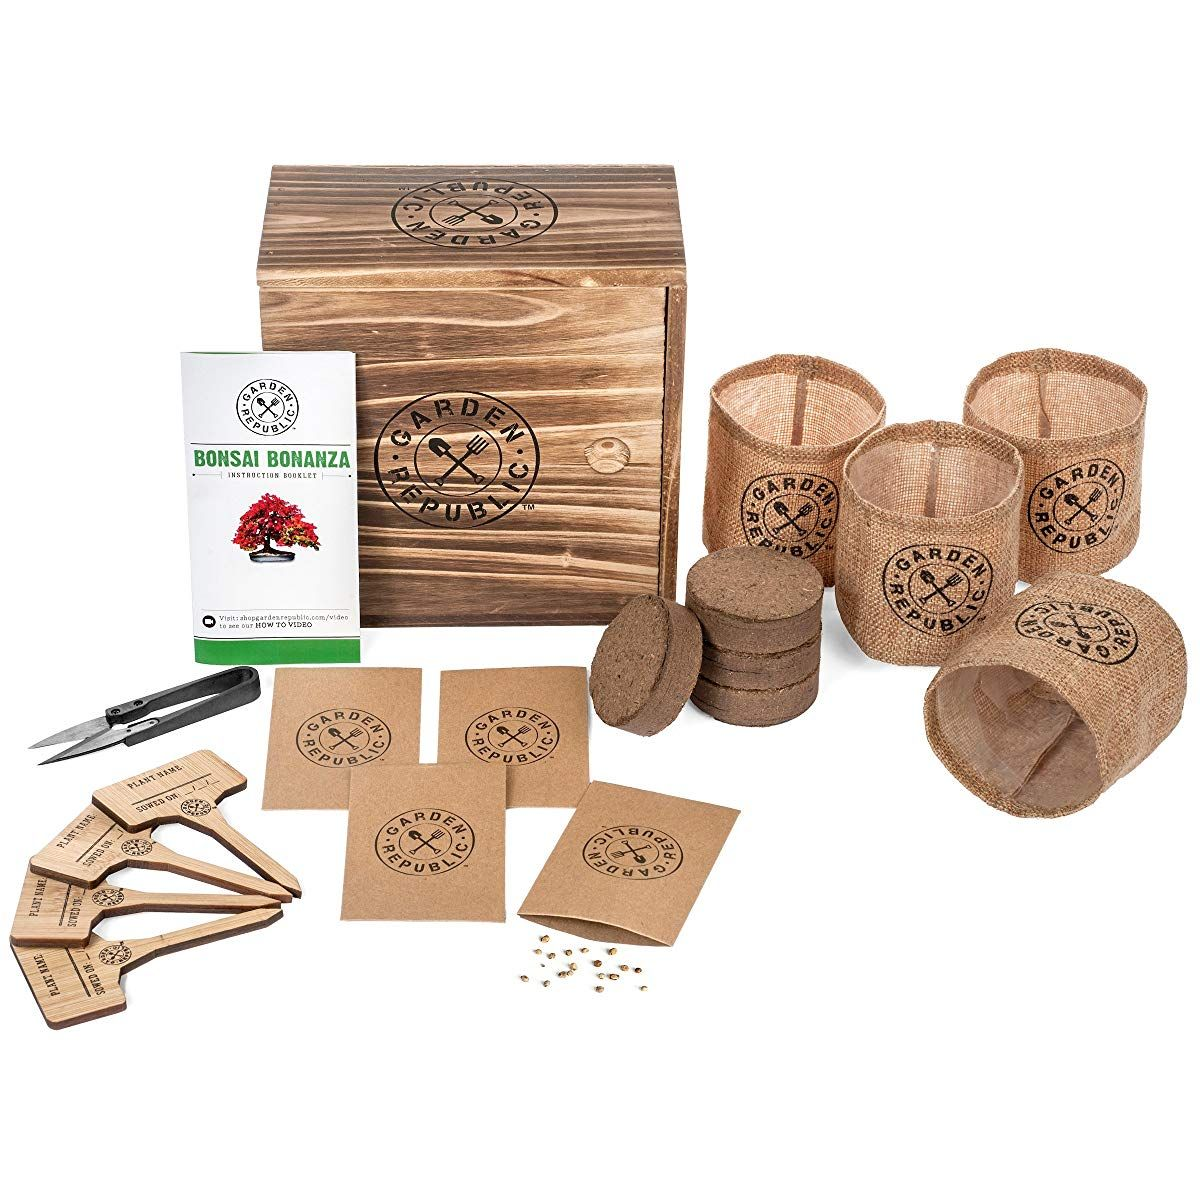 Bonsai tree seed starter kit indoor garden gardening